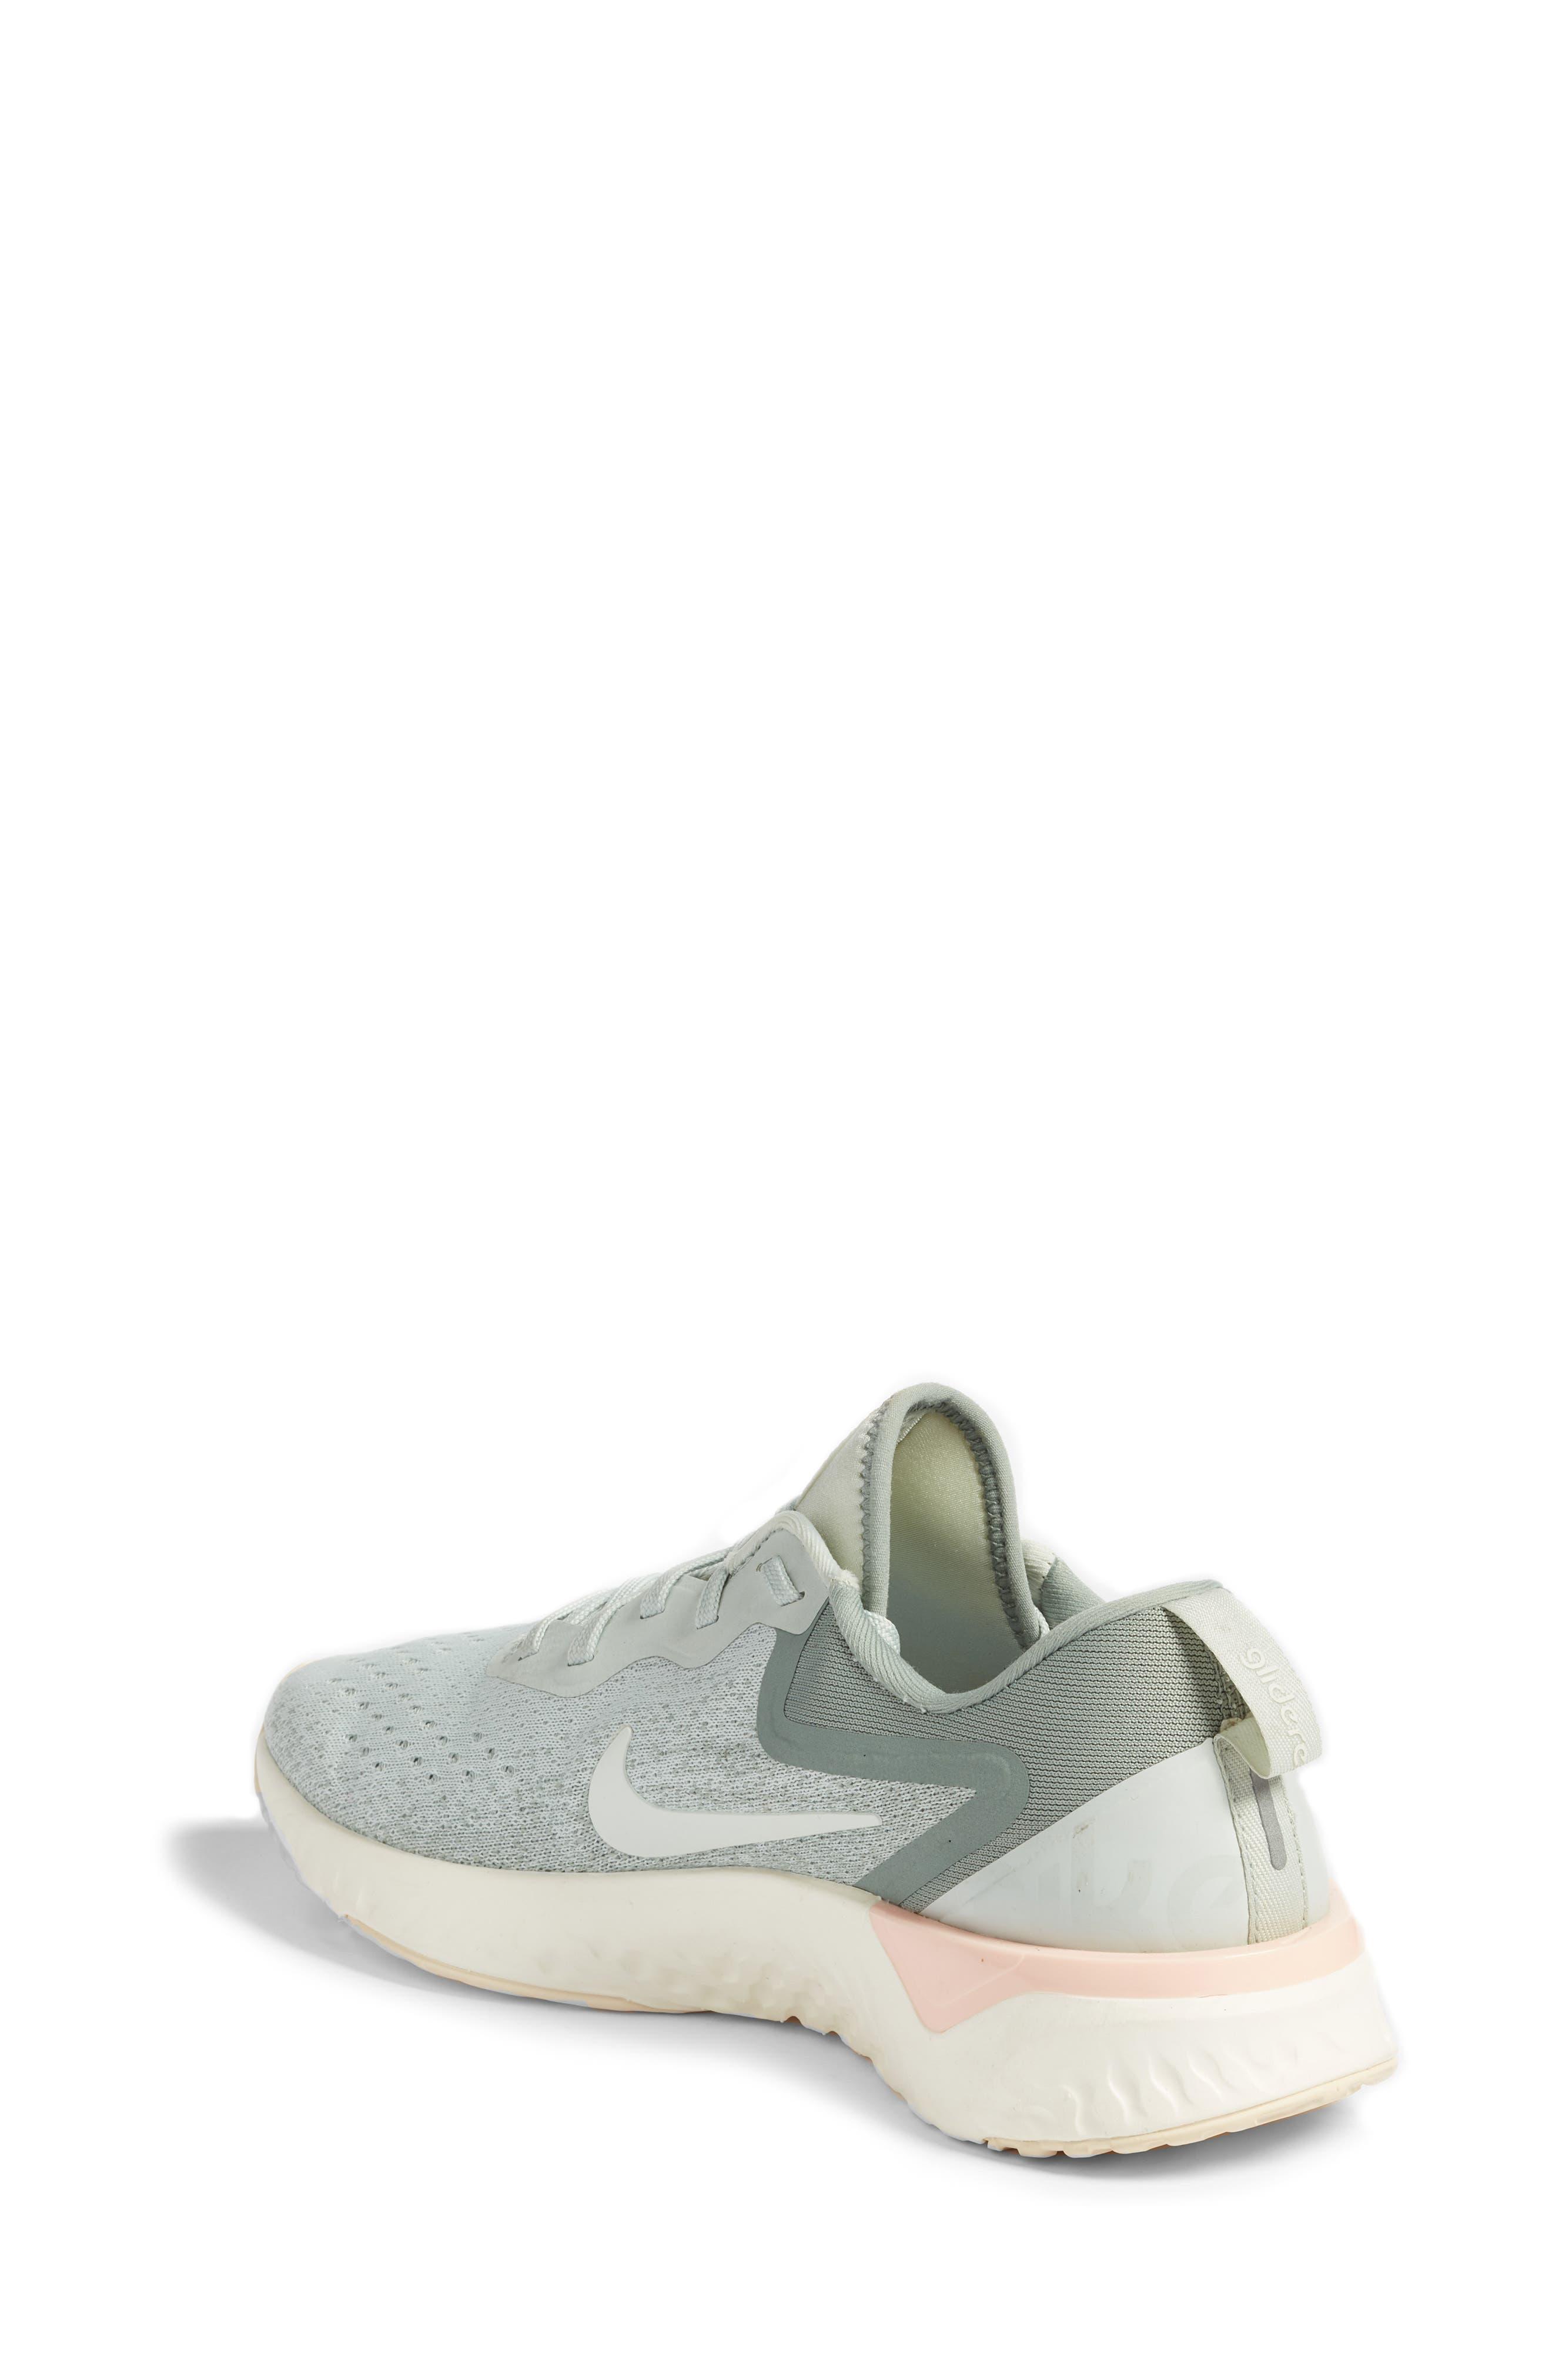 Odyssey React Running Shoe,                             Alternate thumbnail 2, color,                             LIGHT SILVER/ SAIL/ MICA GREEN